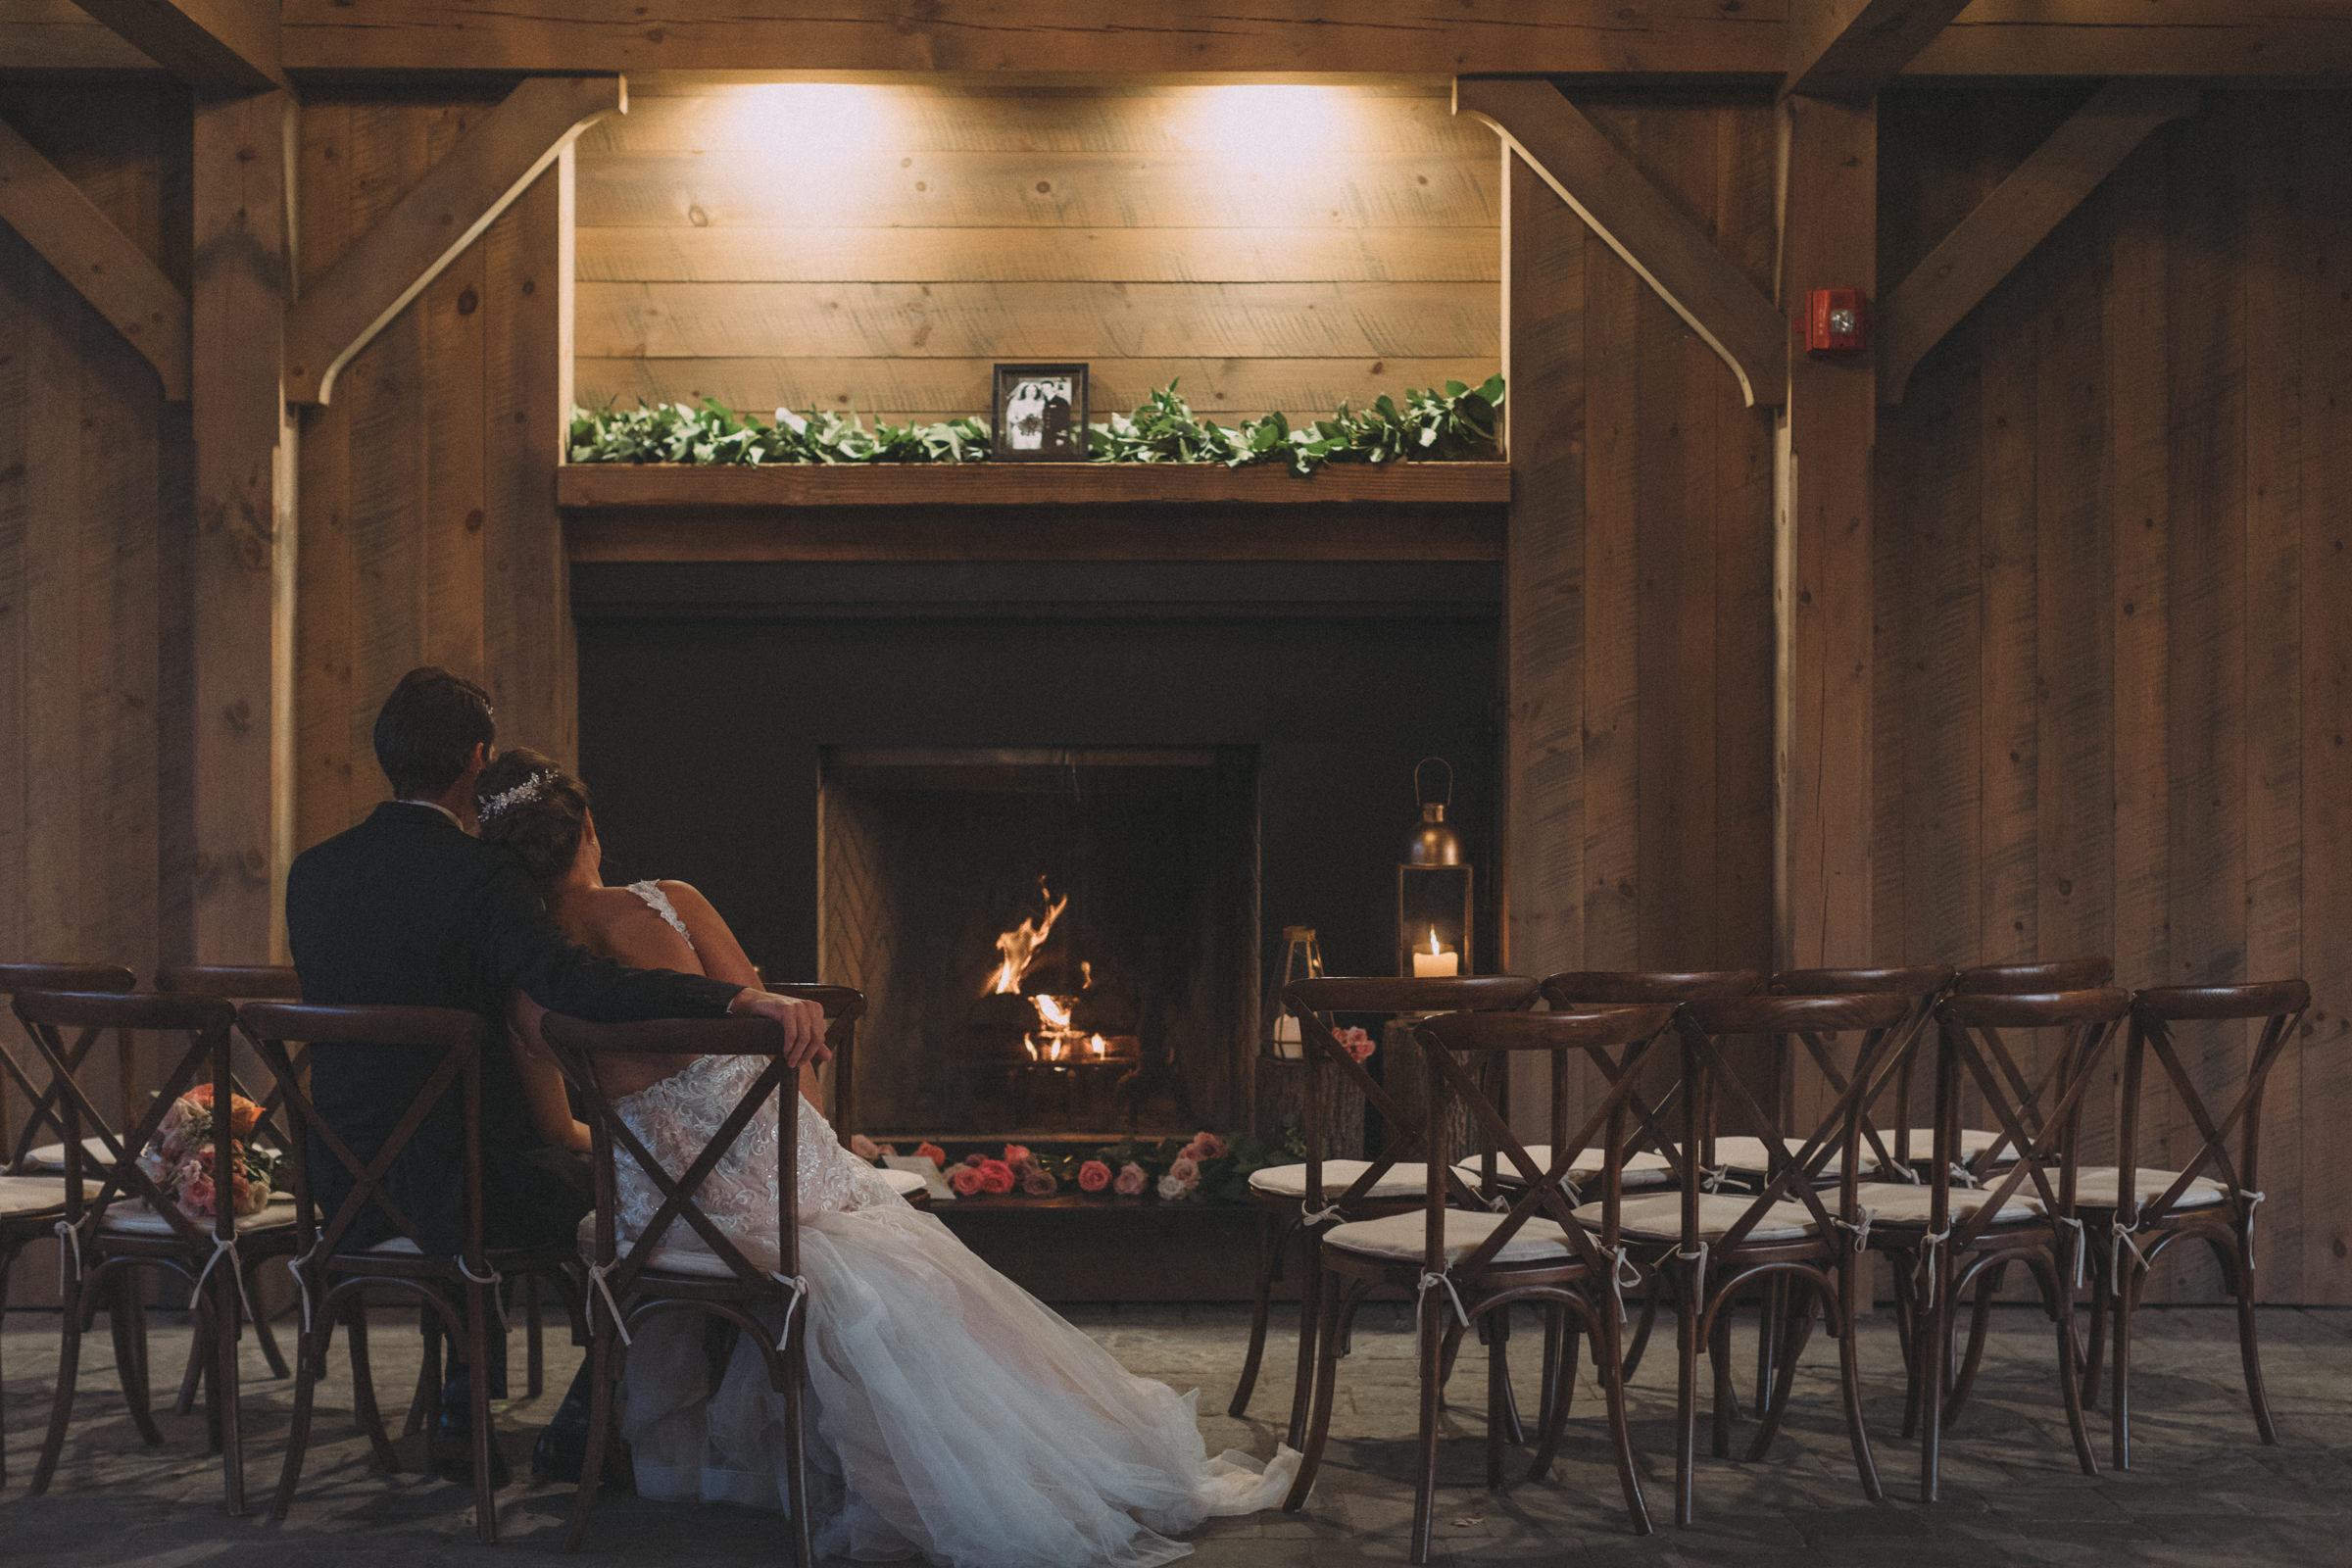 Langdon-Hall-wedding-photography-Cambridge-by-Sam-Wong-of-Visual-Cravings_Sarah-Ryan_64.jpg